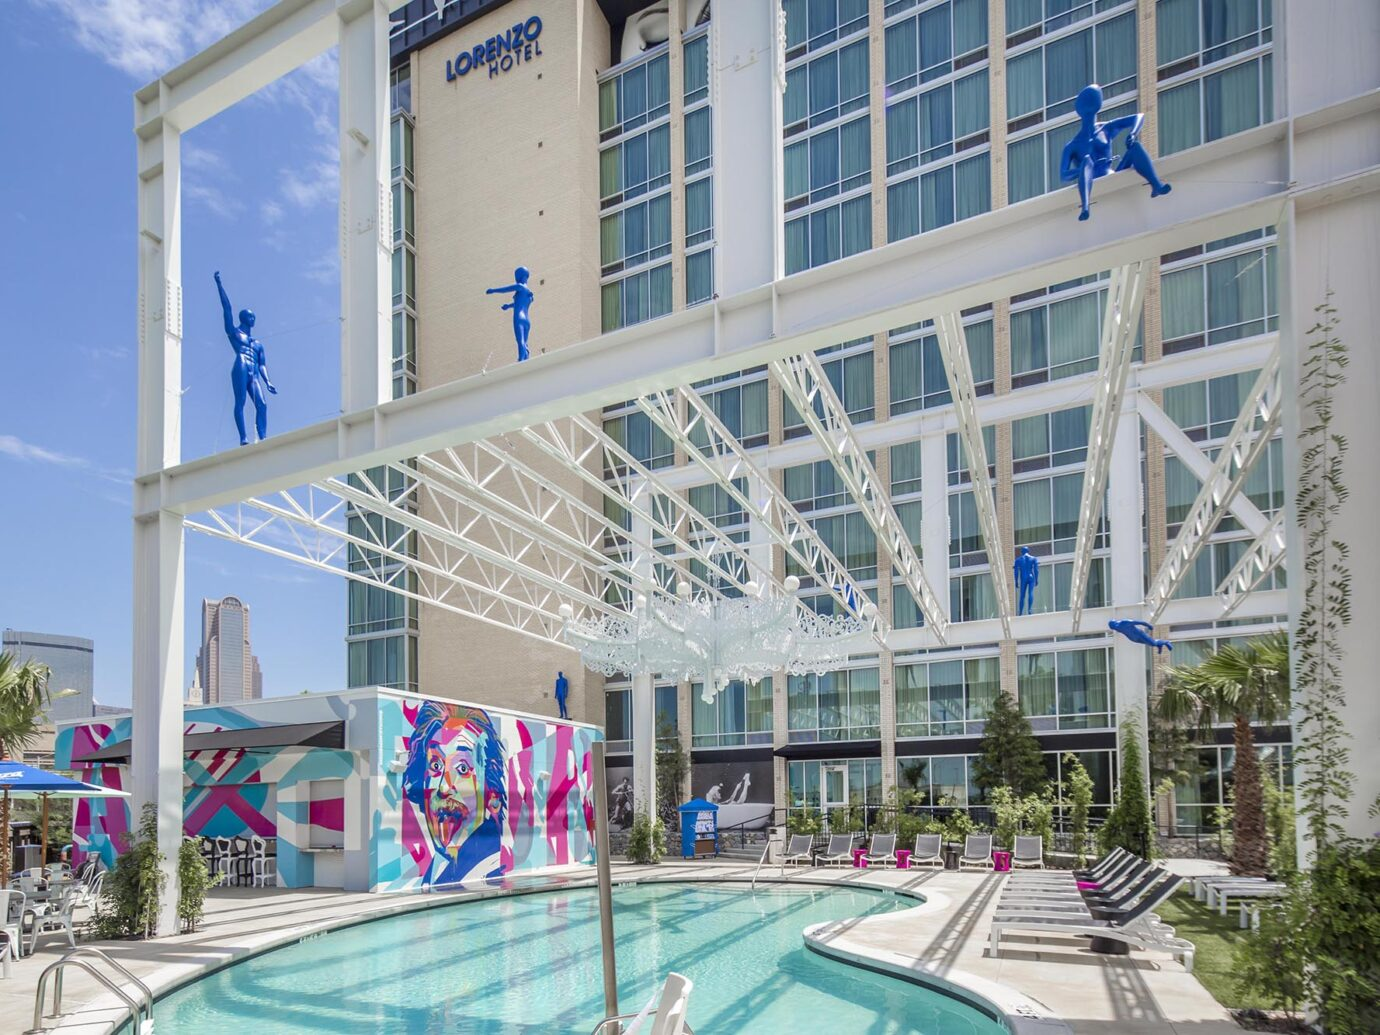 Pool at Lorenzo Hotel, Dallas, TX